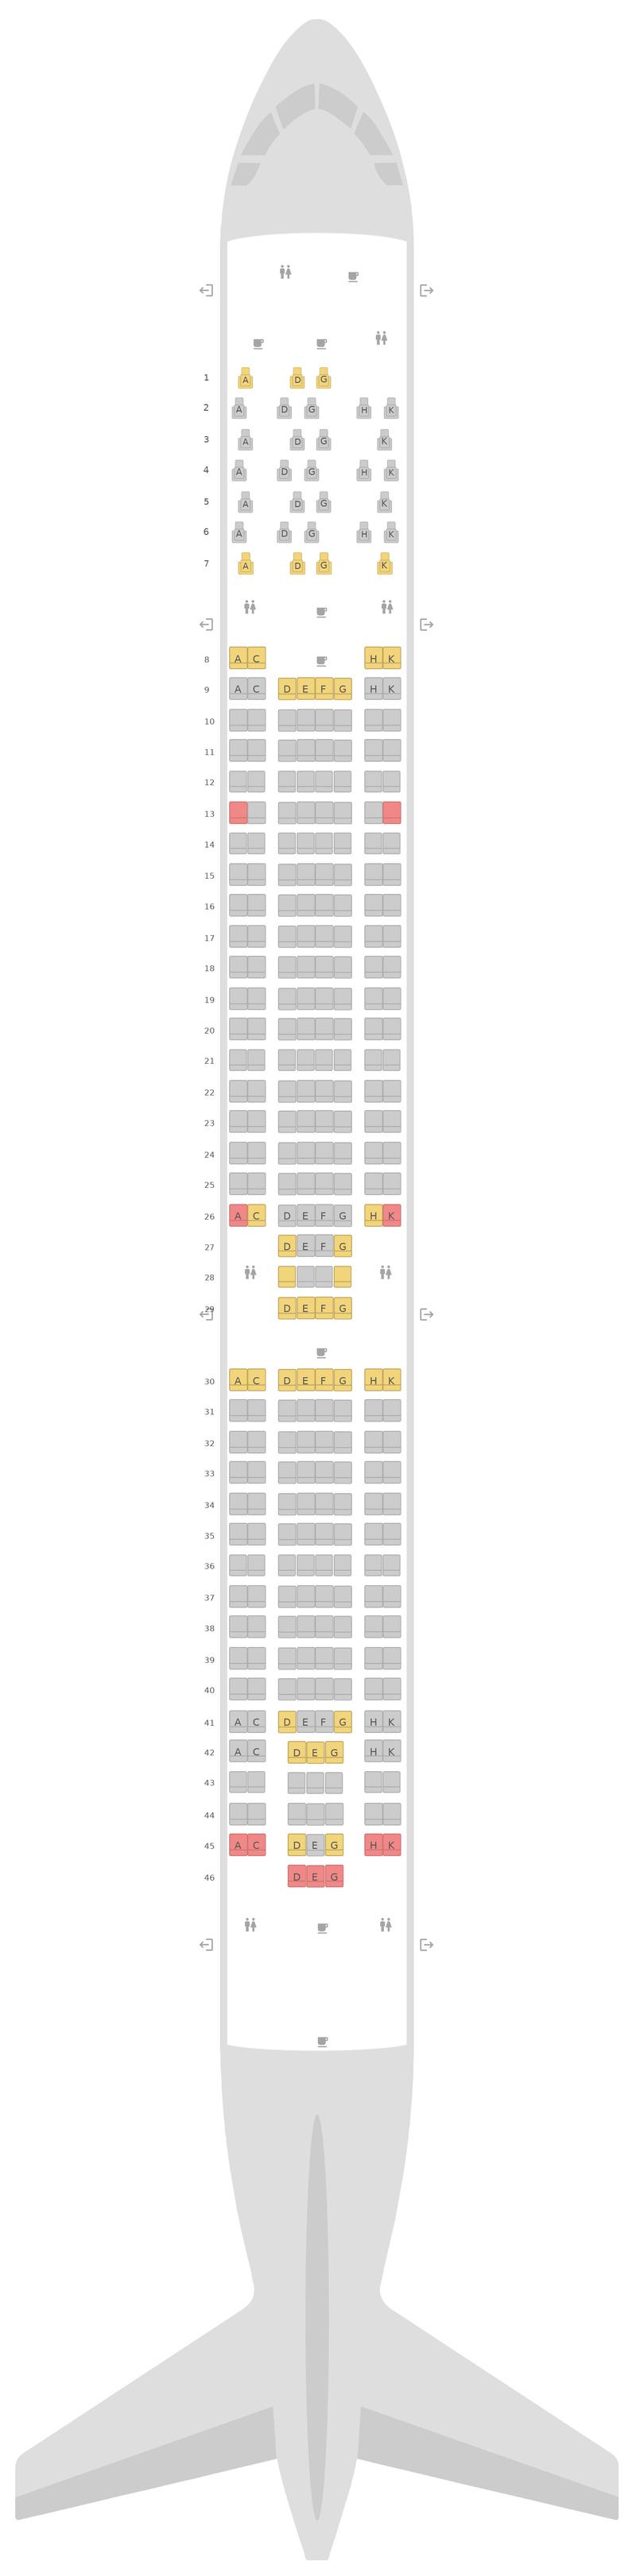 Mapa de asientos Airbus A330-300 (333) Aer Lingus